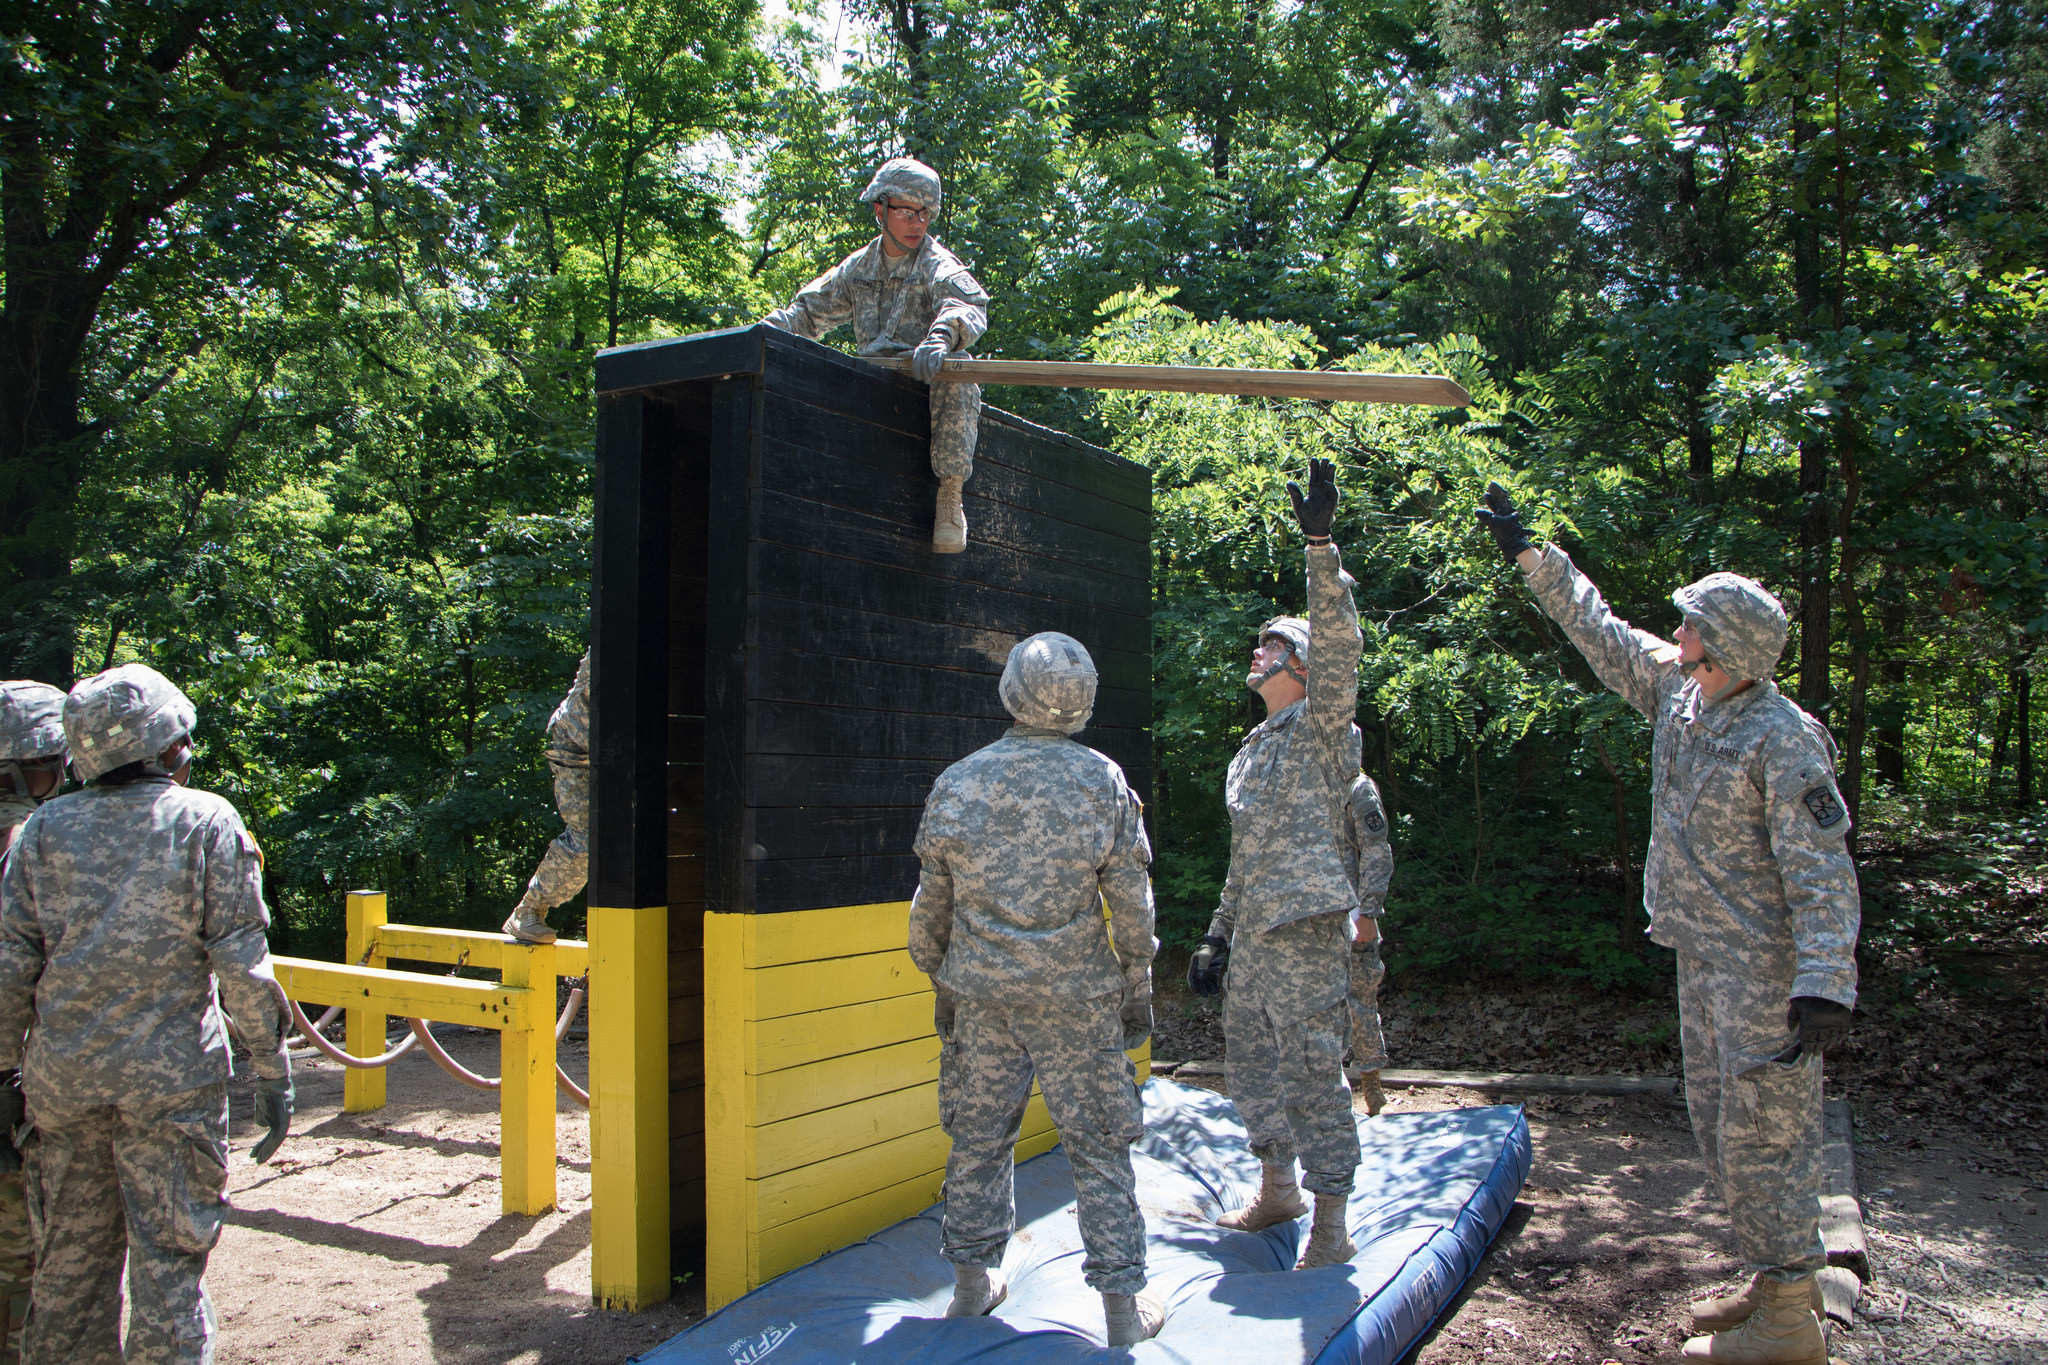 Teamwork Makes the Dream Work: Cadets Complete Team Development Course